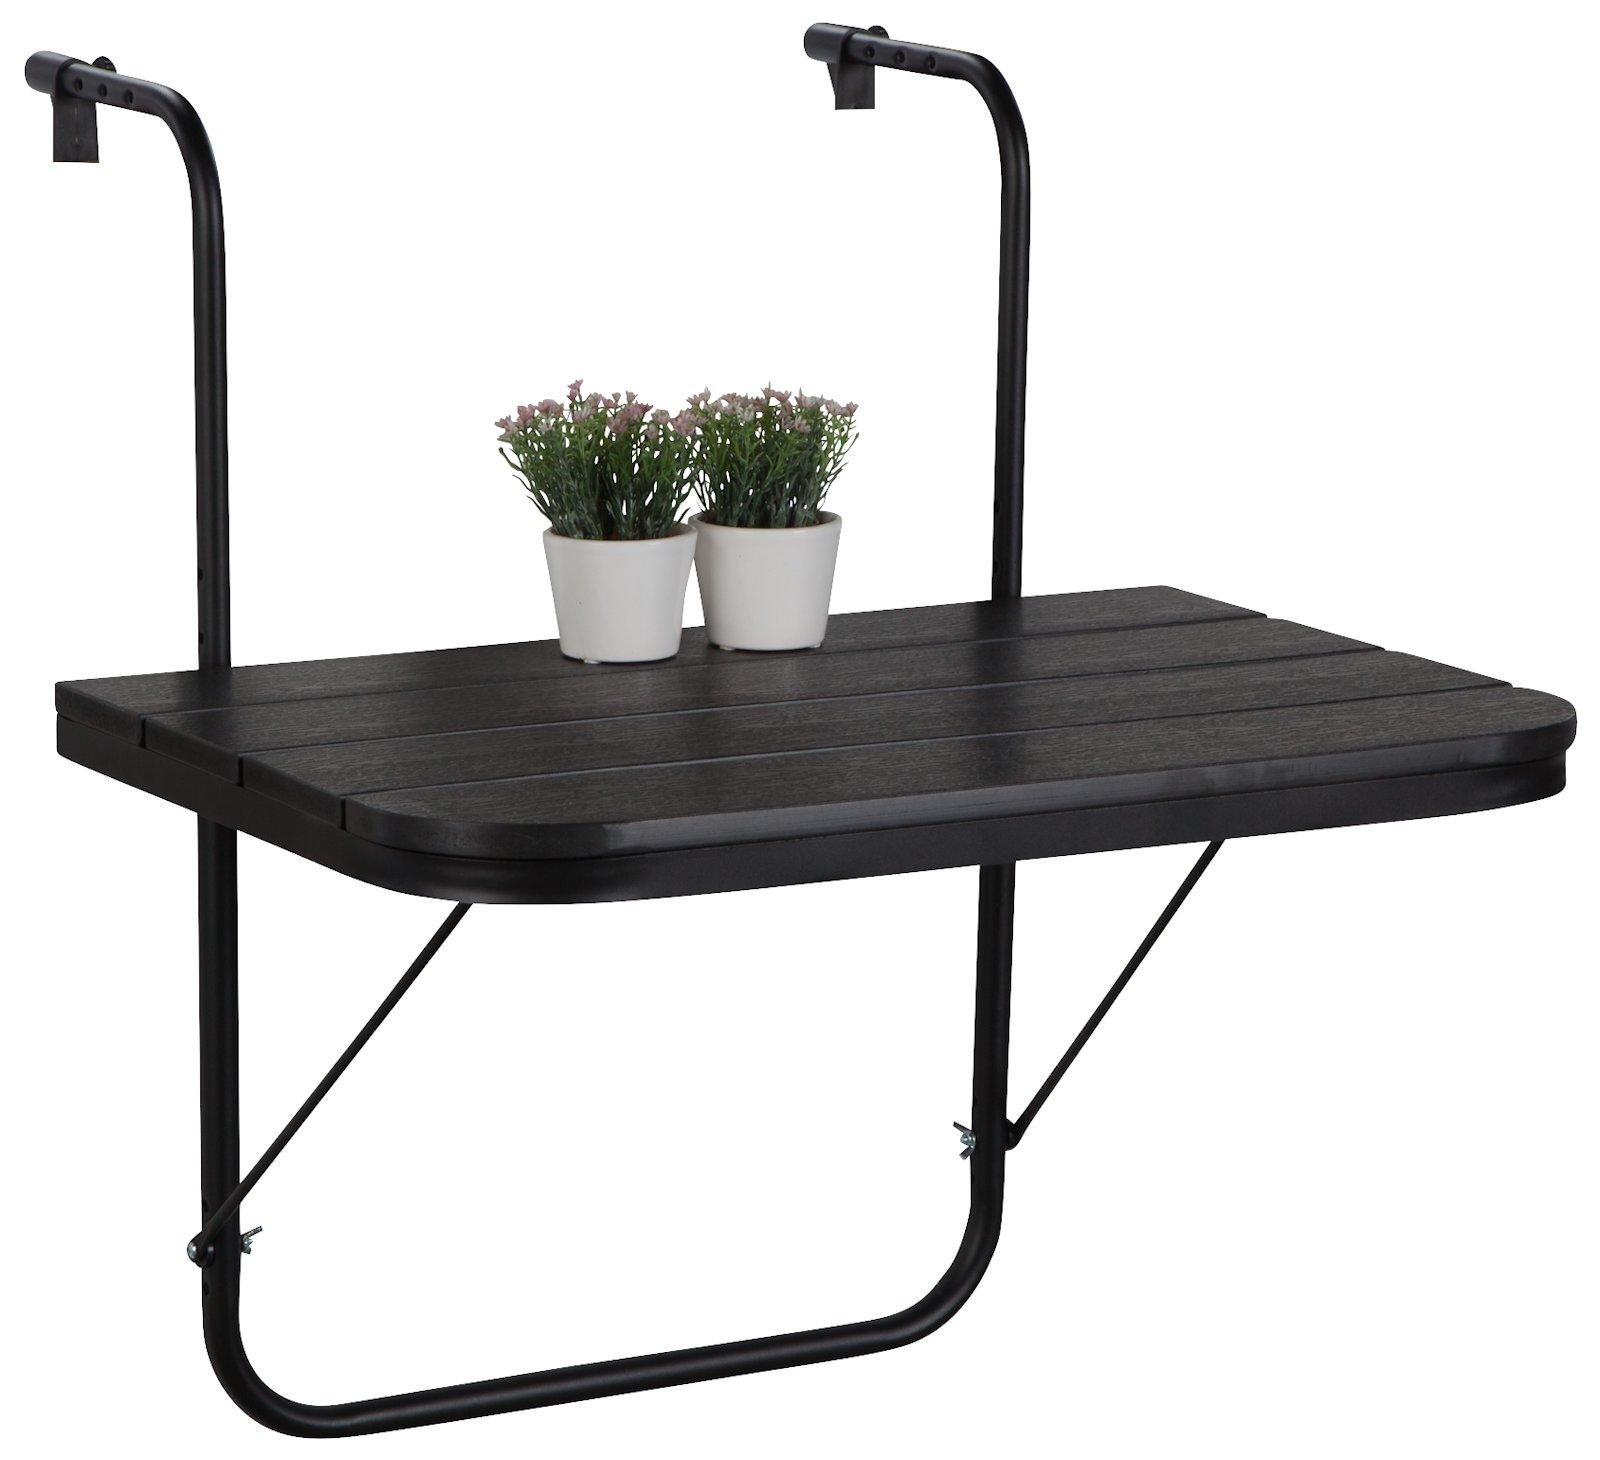 Balkongbord 60X40 Cm Non-Wood - Harald Nyborg 6bfa3a262251f